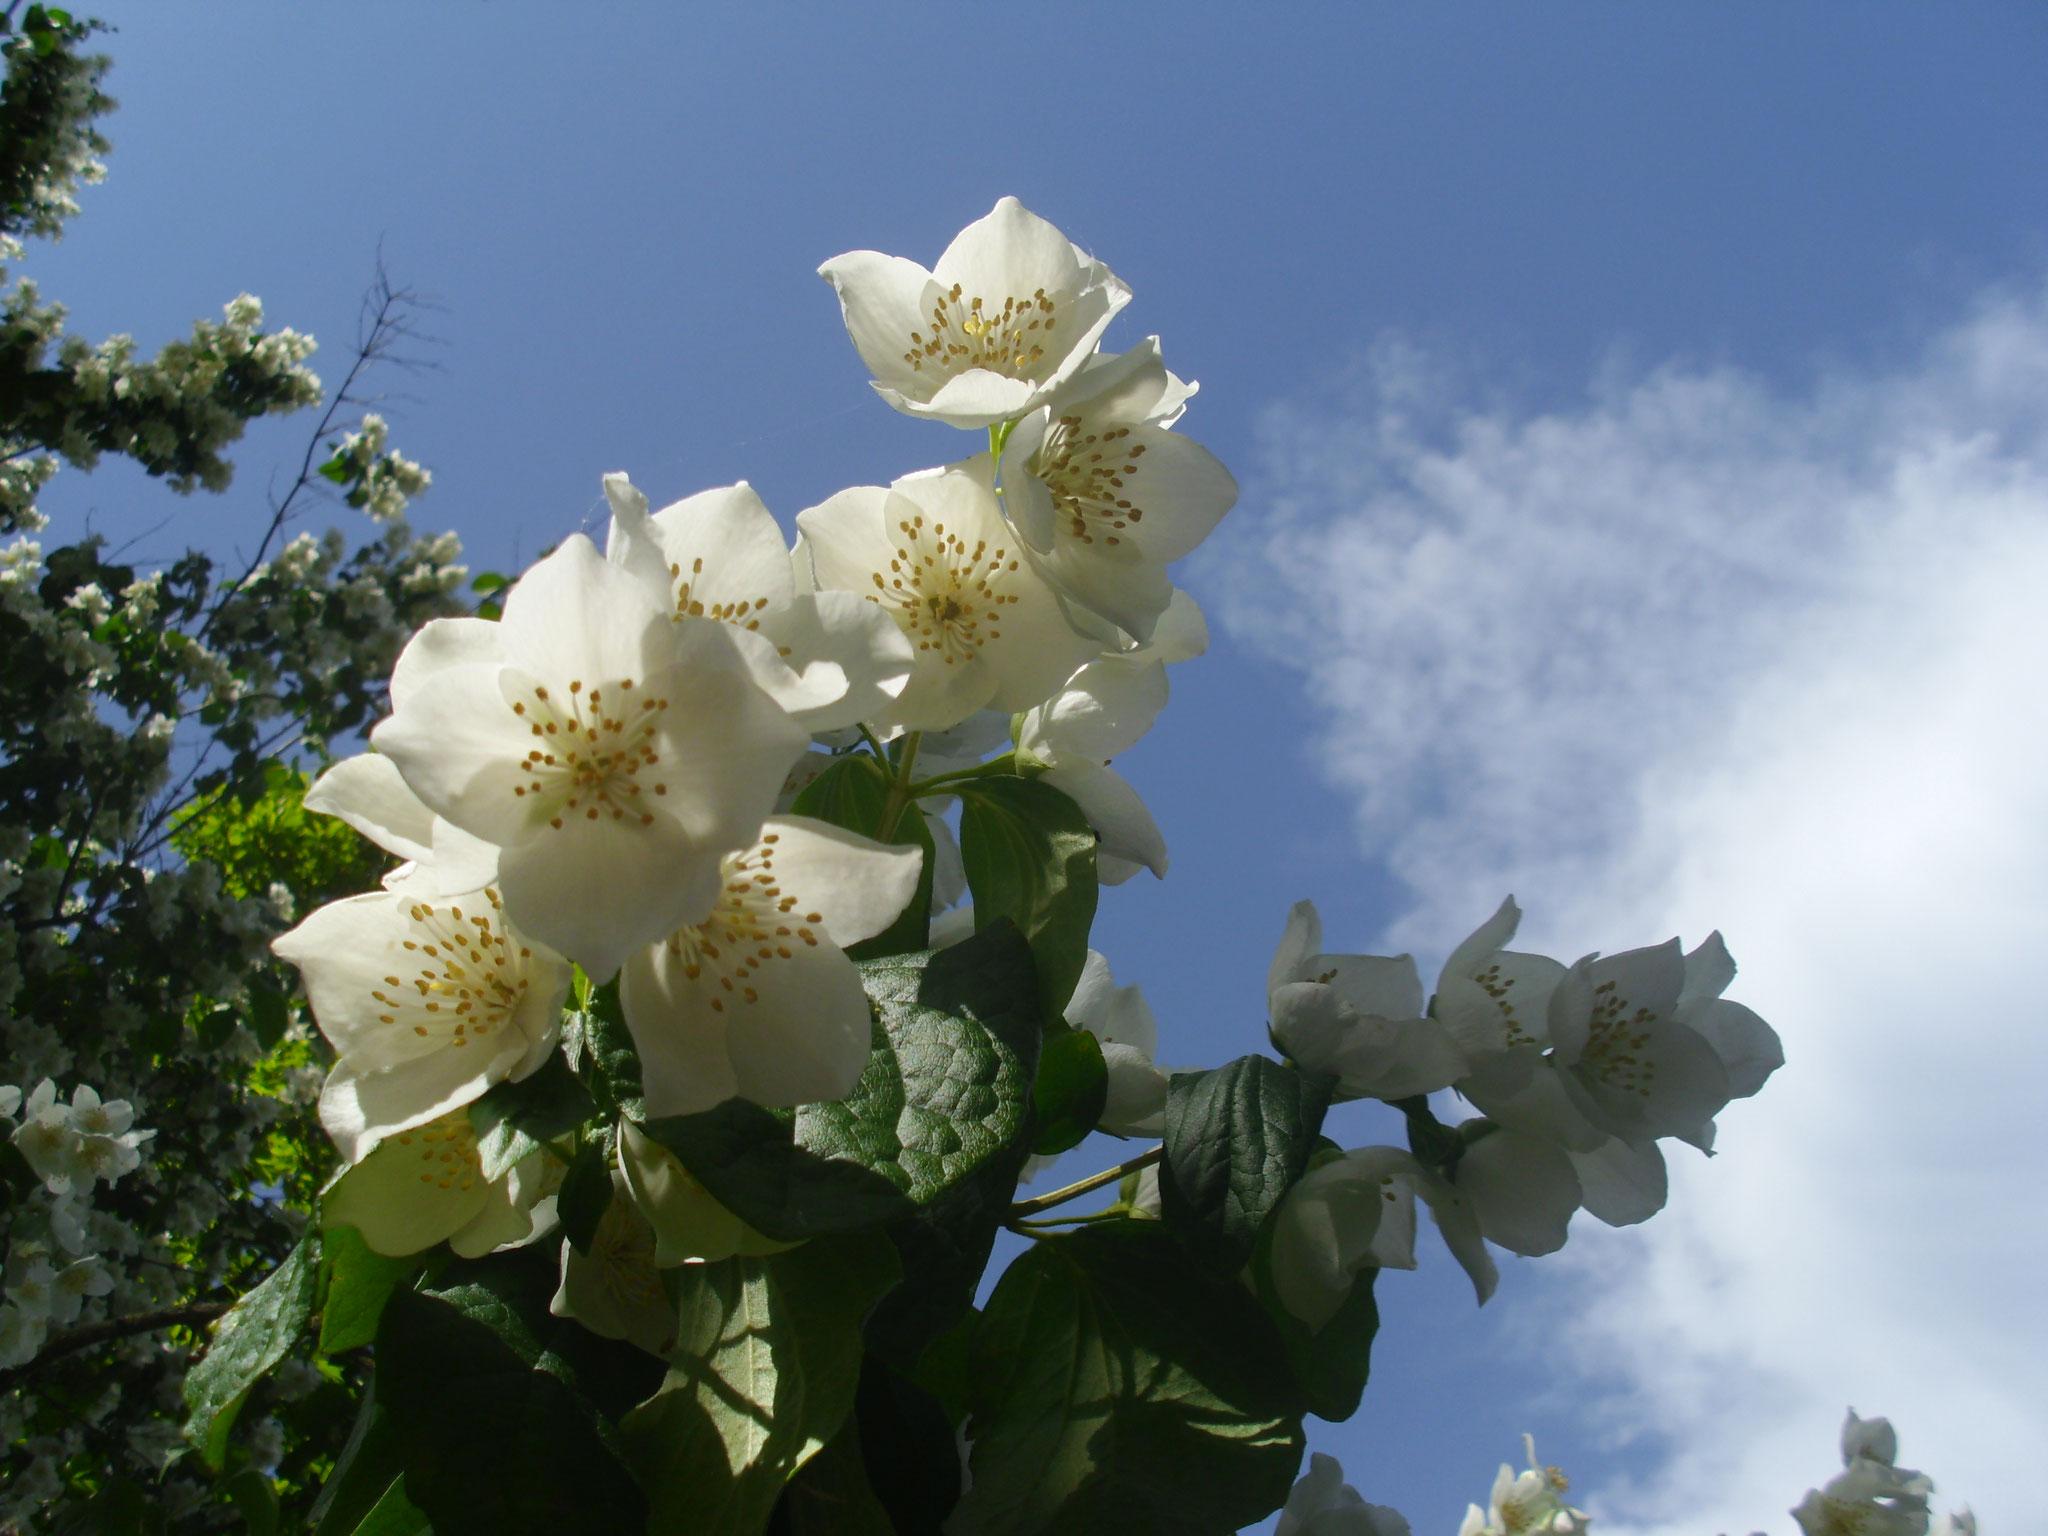 Fein duftende Jasminblüten